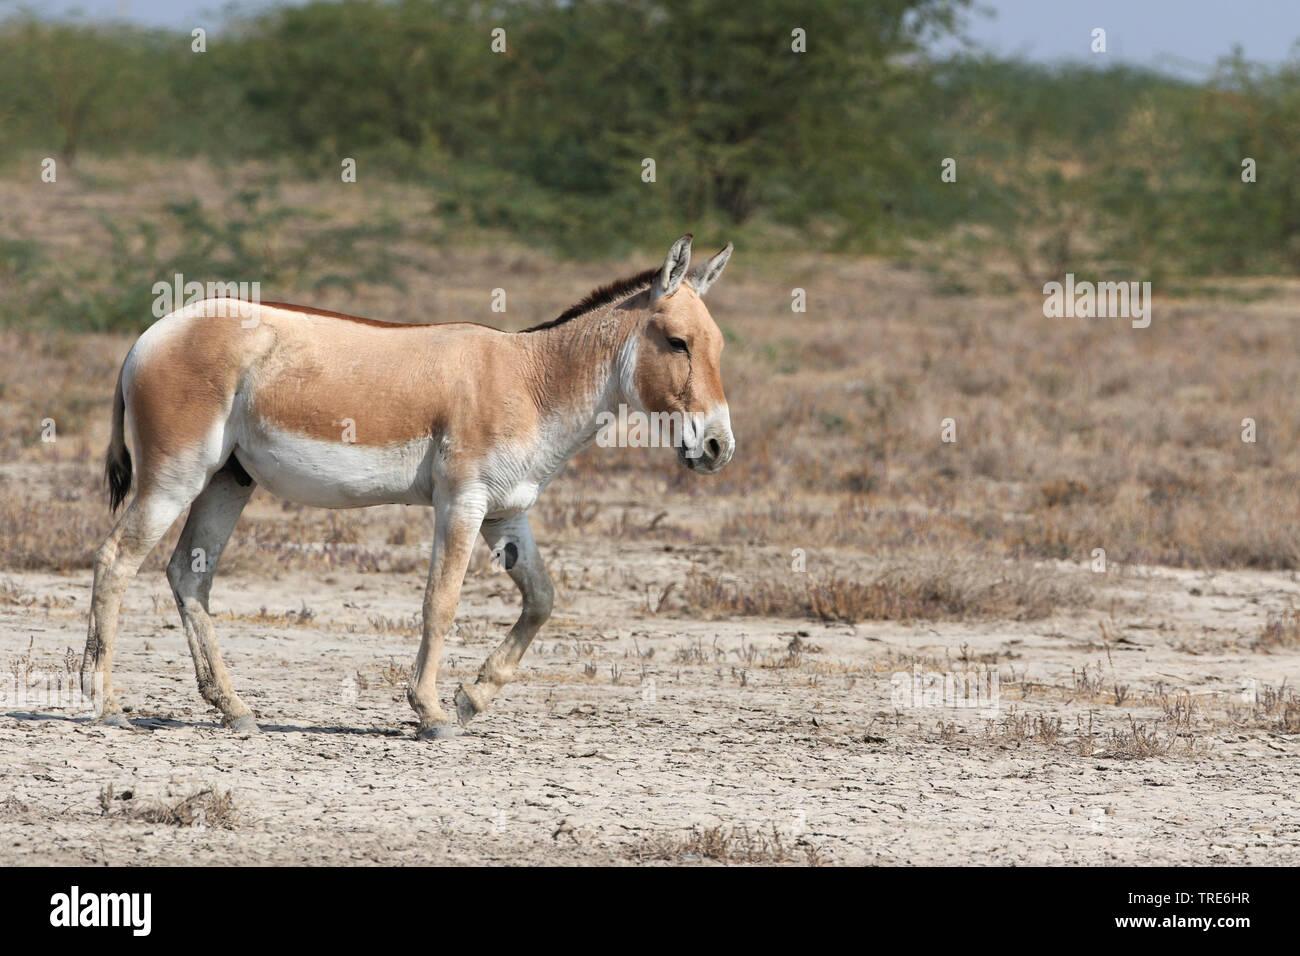 Asiatischer Halbesel, Onager, Kulan (Equus hemionus), holzbilderrahmen, Indien, wenig Rann von Kutch | Kulan, Khur, Onager, Dziggetai (Equus hemionus), standin Stockbild